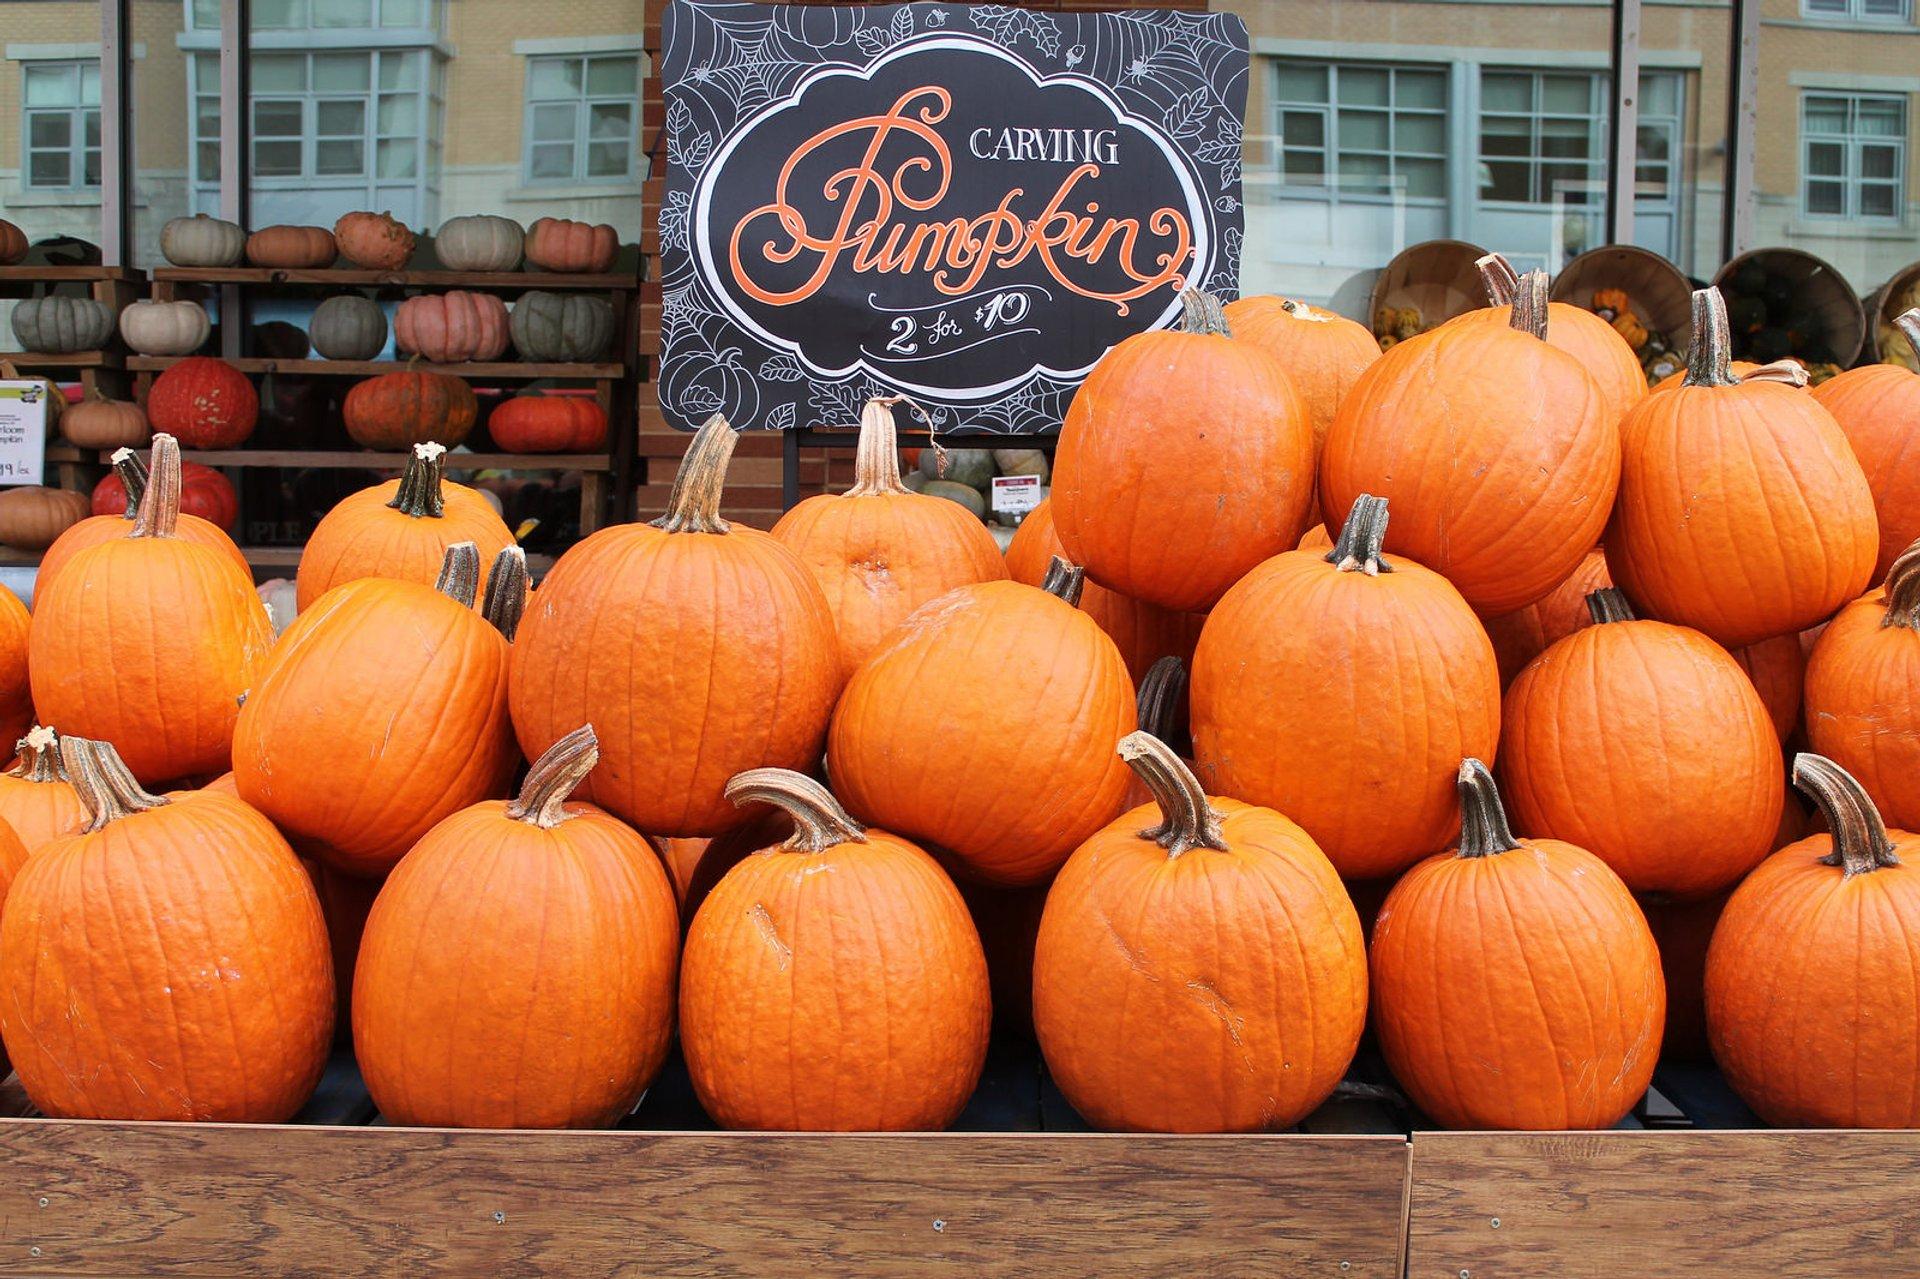 Autumn Pumpkin Patch in Washington, D.C. 2020 - Best Time